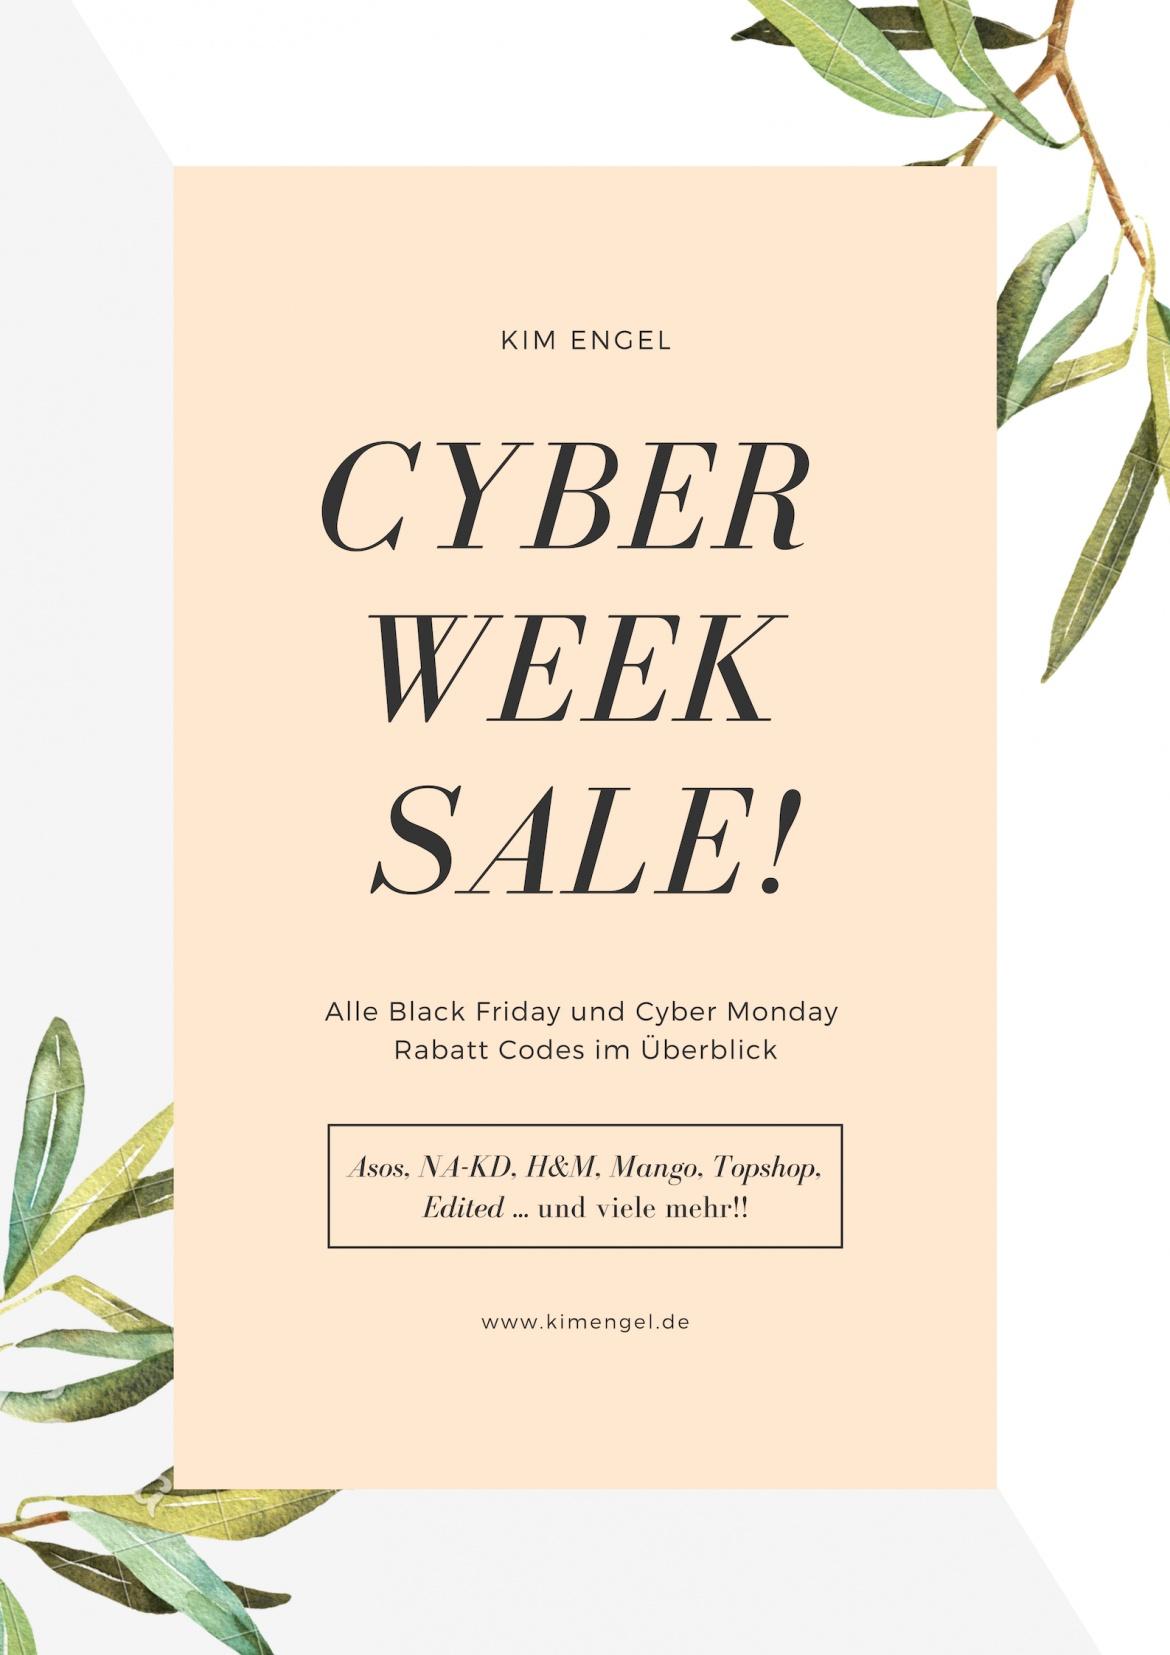 Cyber Week 2018 - alle Rabatt Codes im Überblick - KIM ENGEL